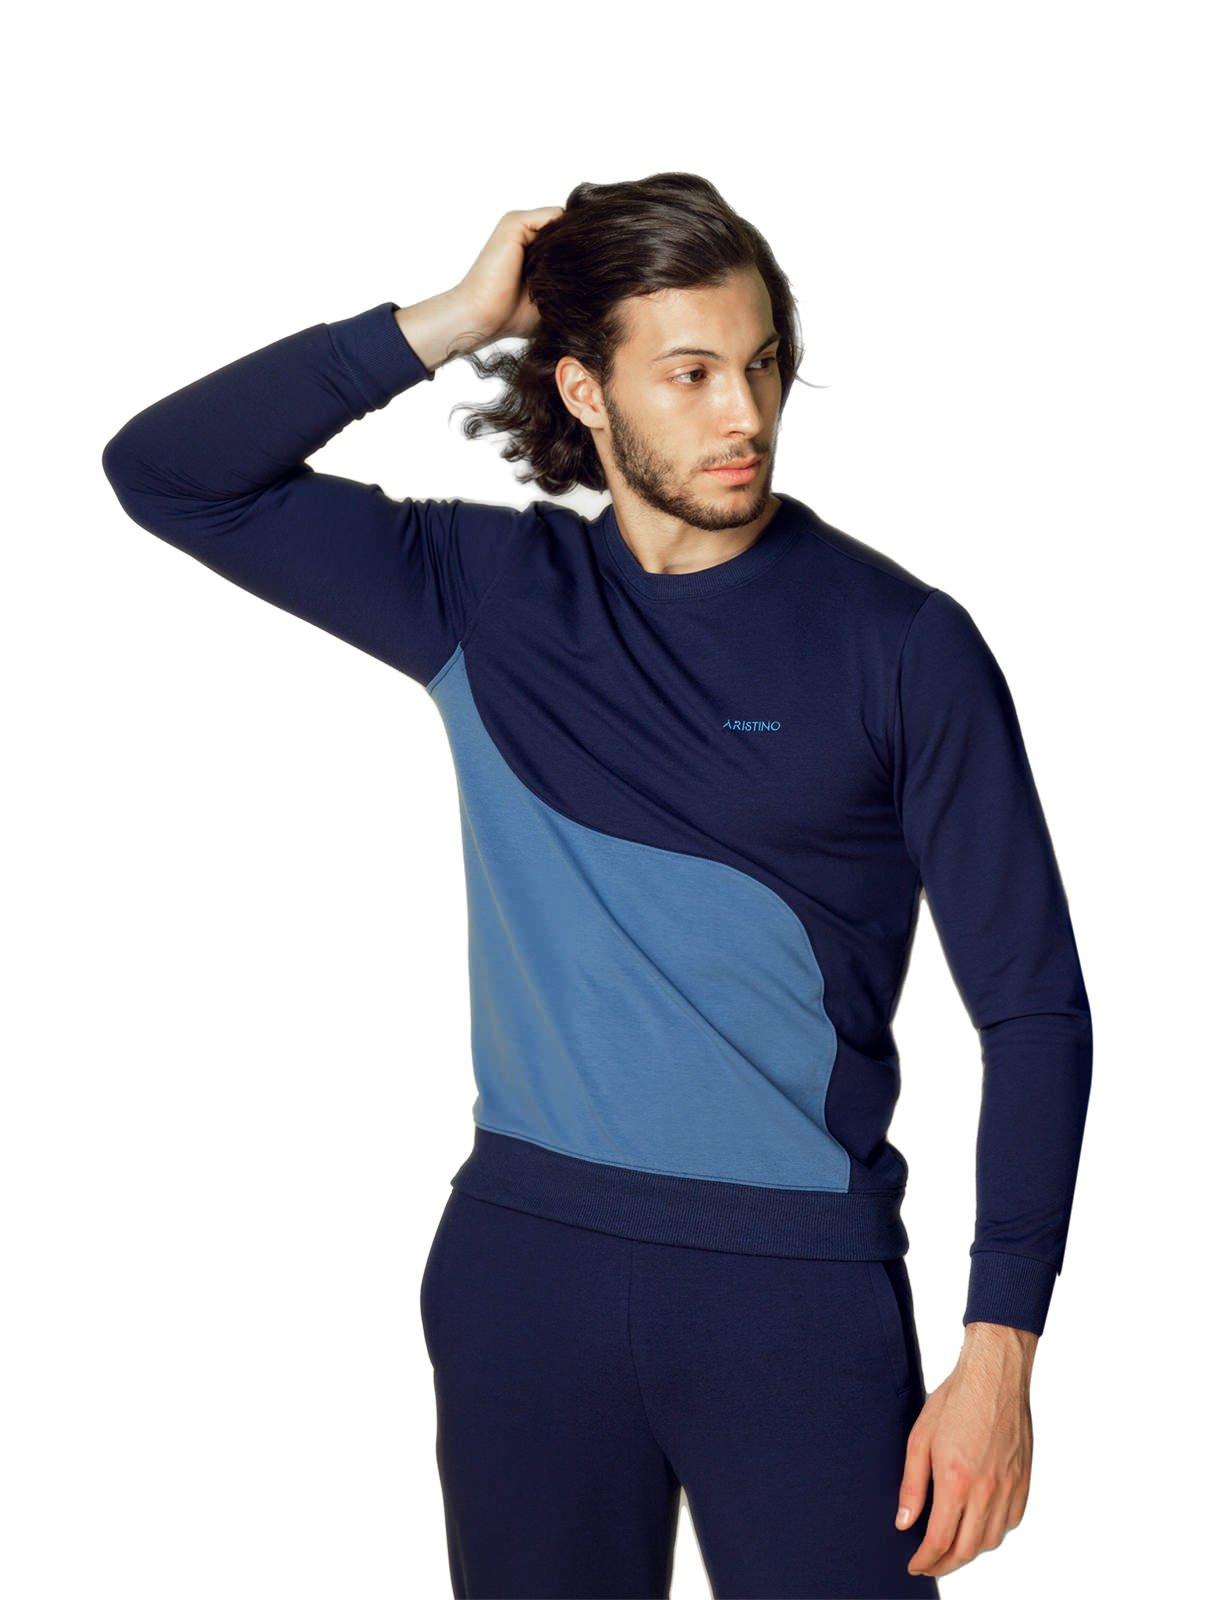 Quần áo thể thao nam Aristino ALH16-09